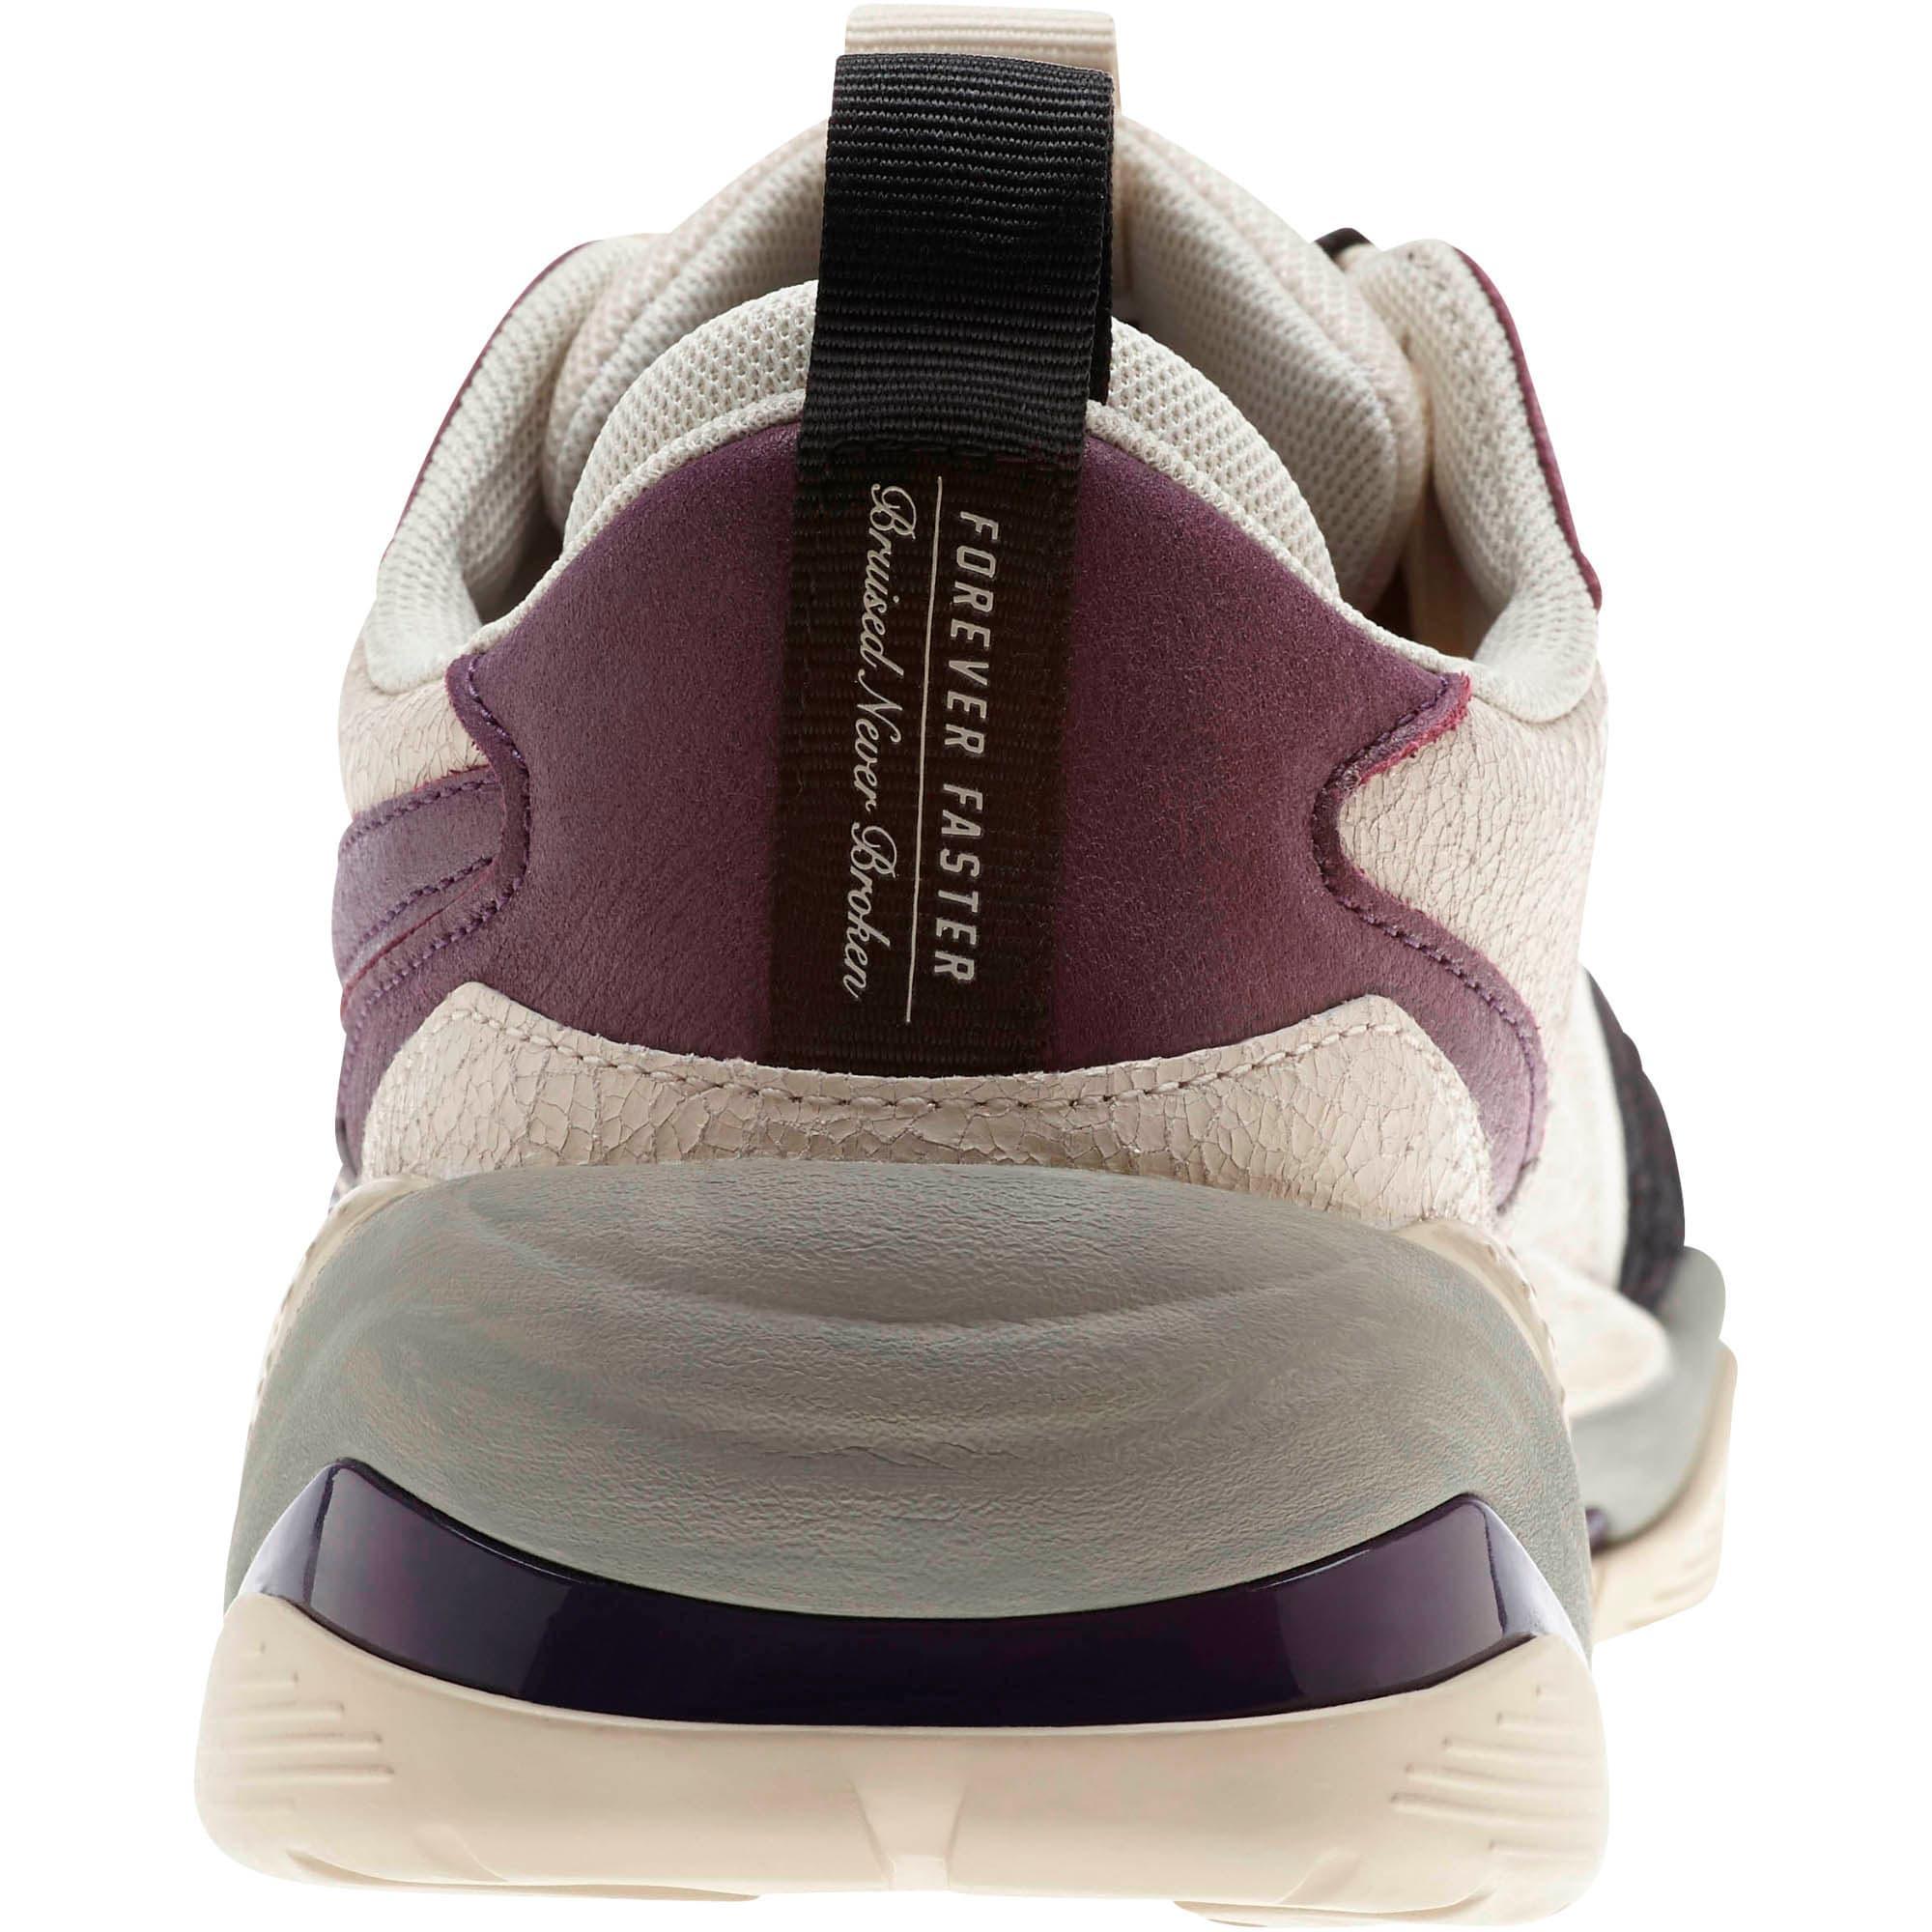 Thumbnail 3 of Thunder x PRPS Sneakers, Birch- Black-Indigo, medium